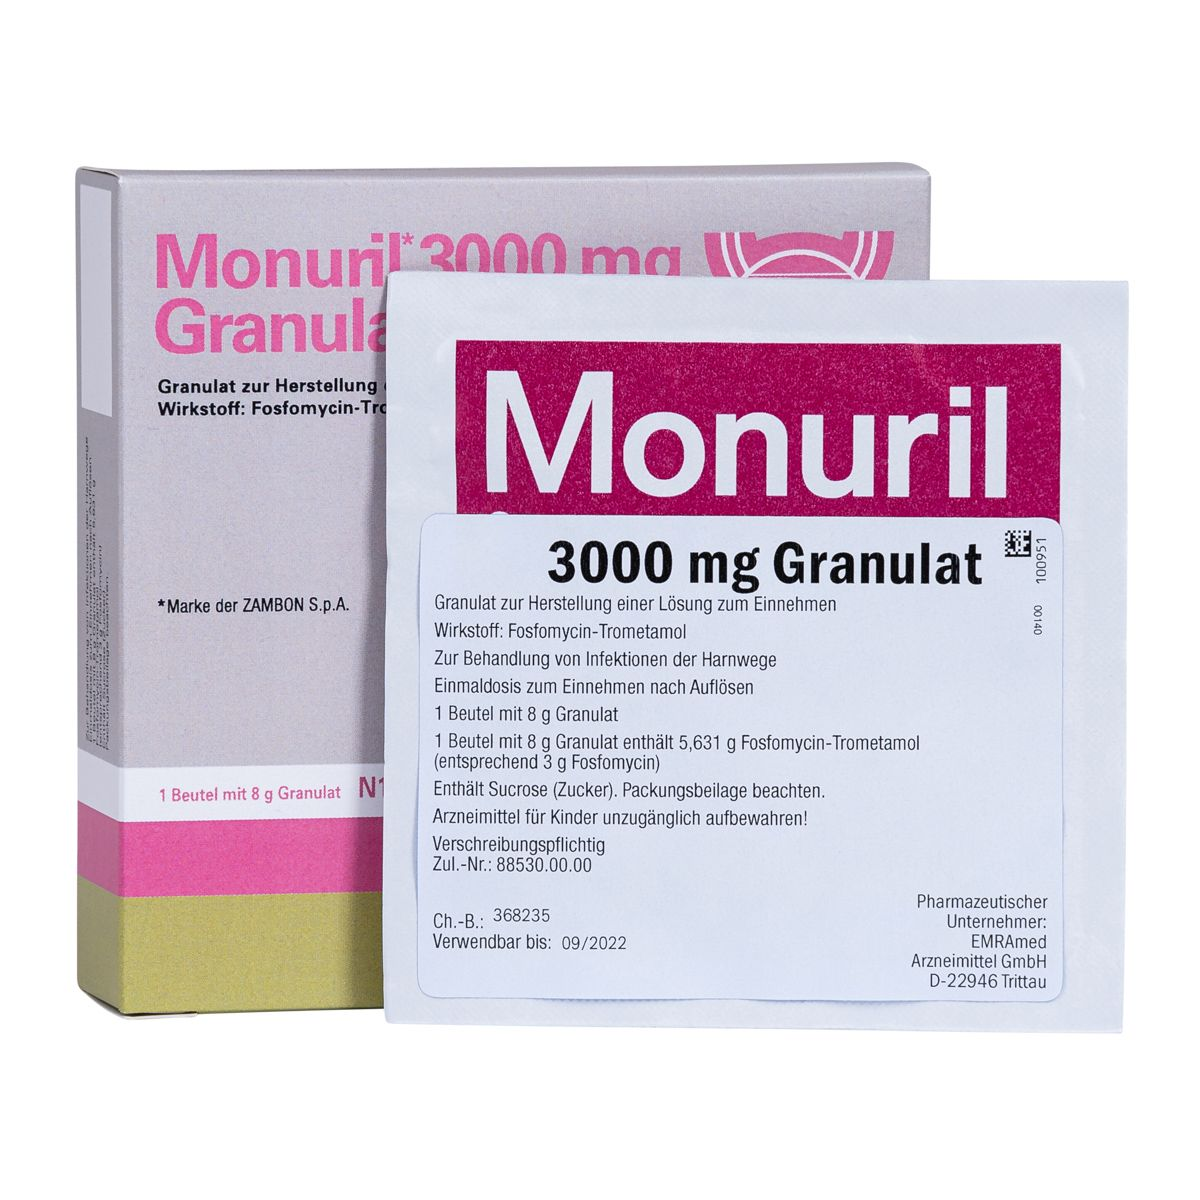 Monuril Nebenwirkungen Wie Lange - Captions Viral Today